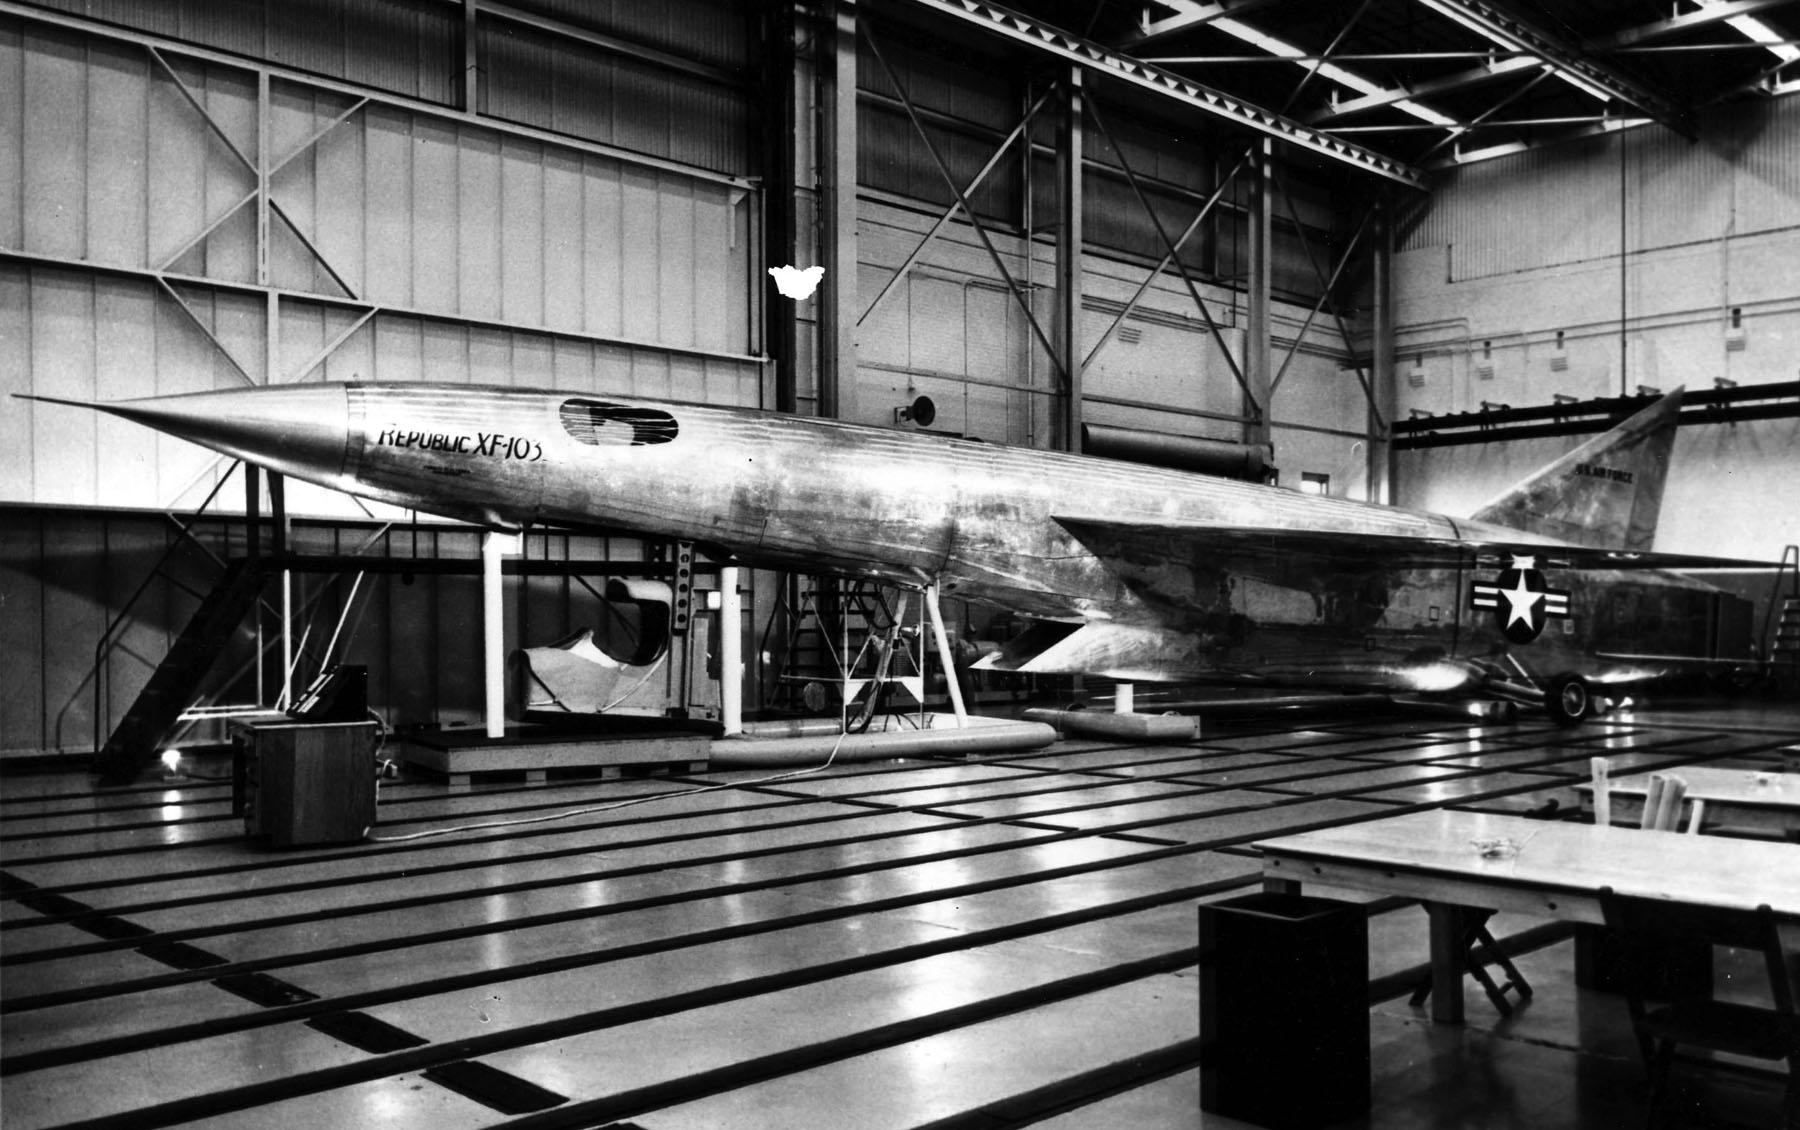 highflight-xf-103-2.jpg